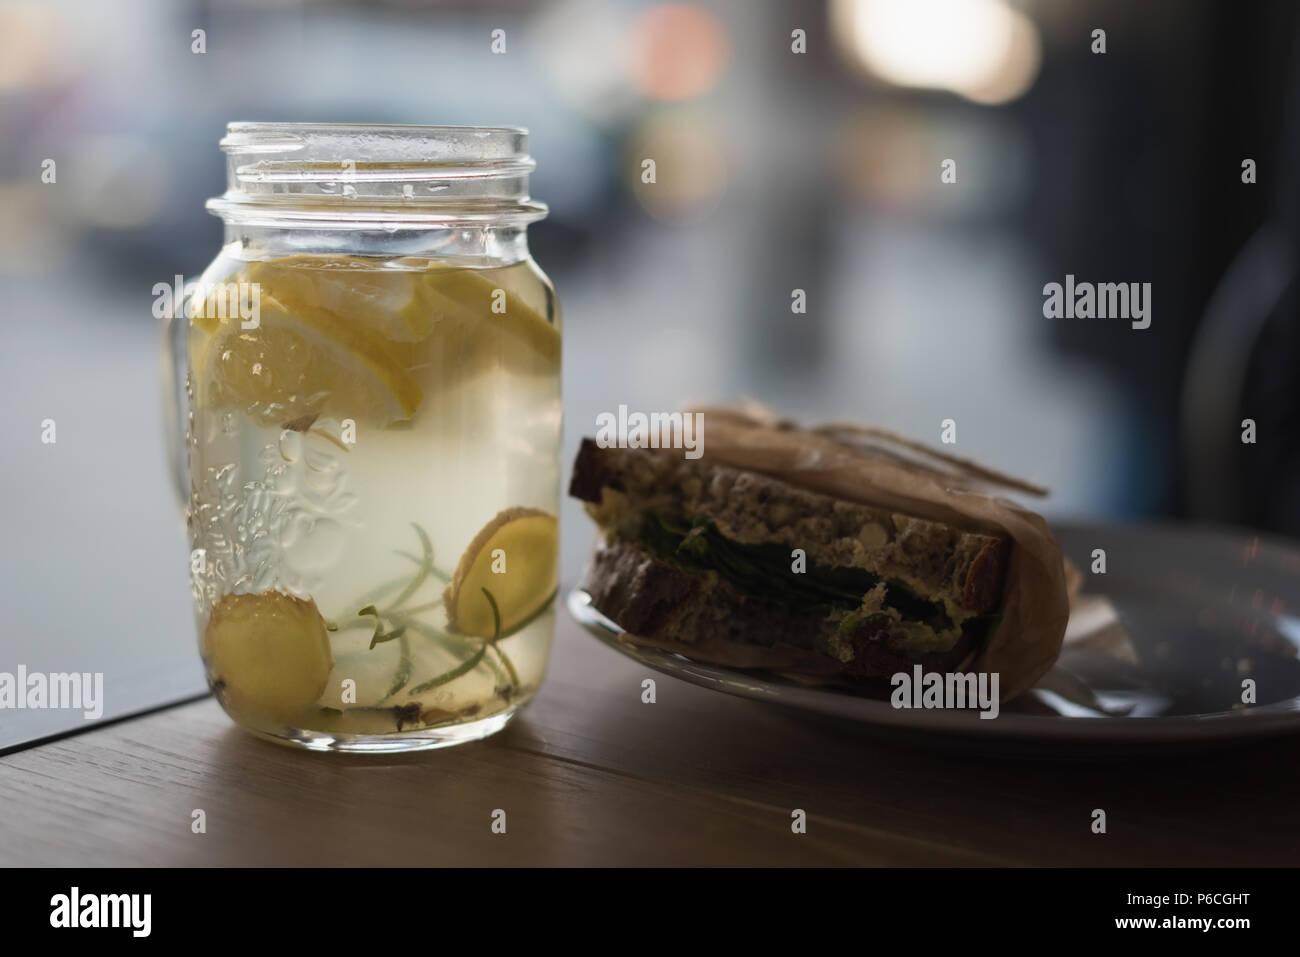 Jar of lemon tea with wrap food on plate Stock Photo